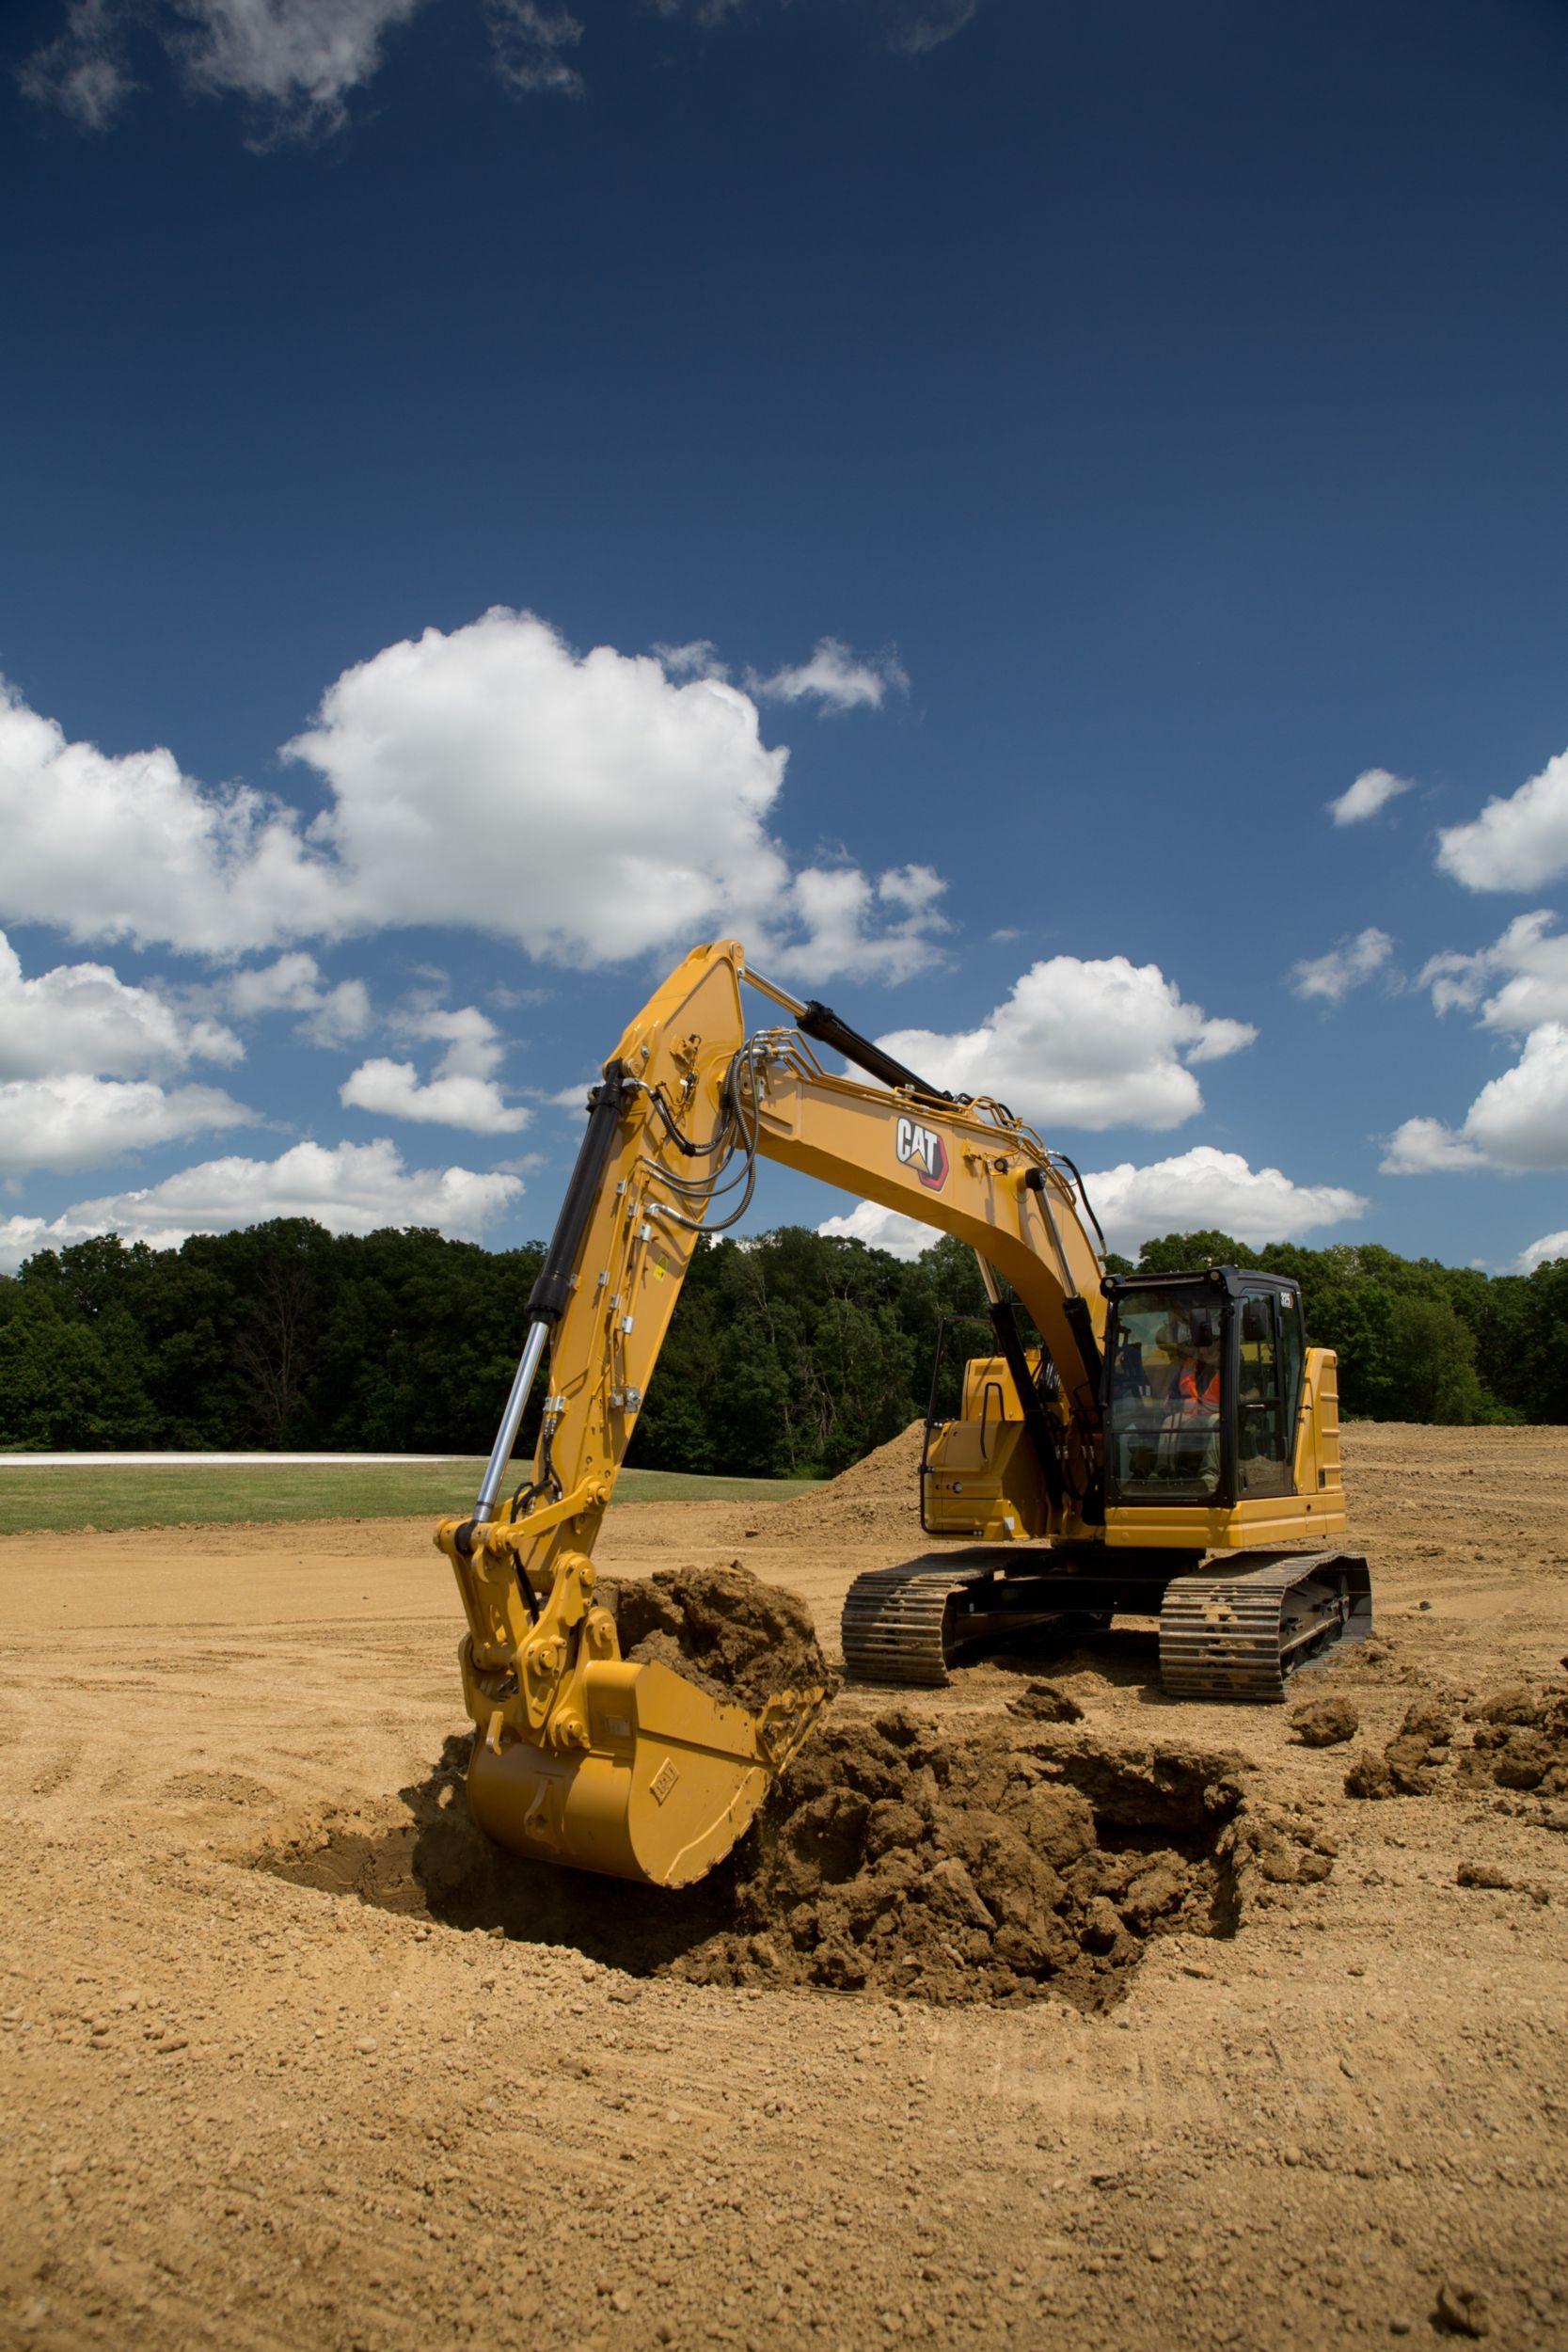 325 Hydraulic Excavator